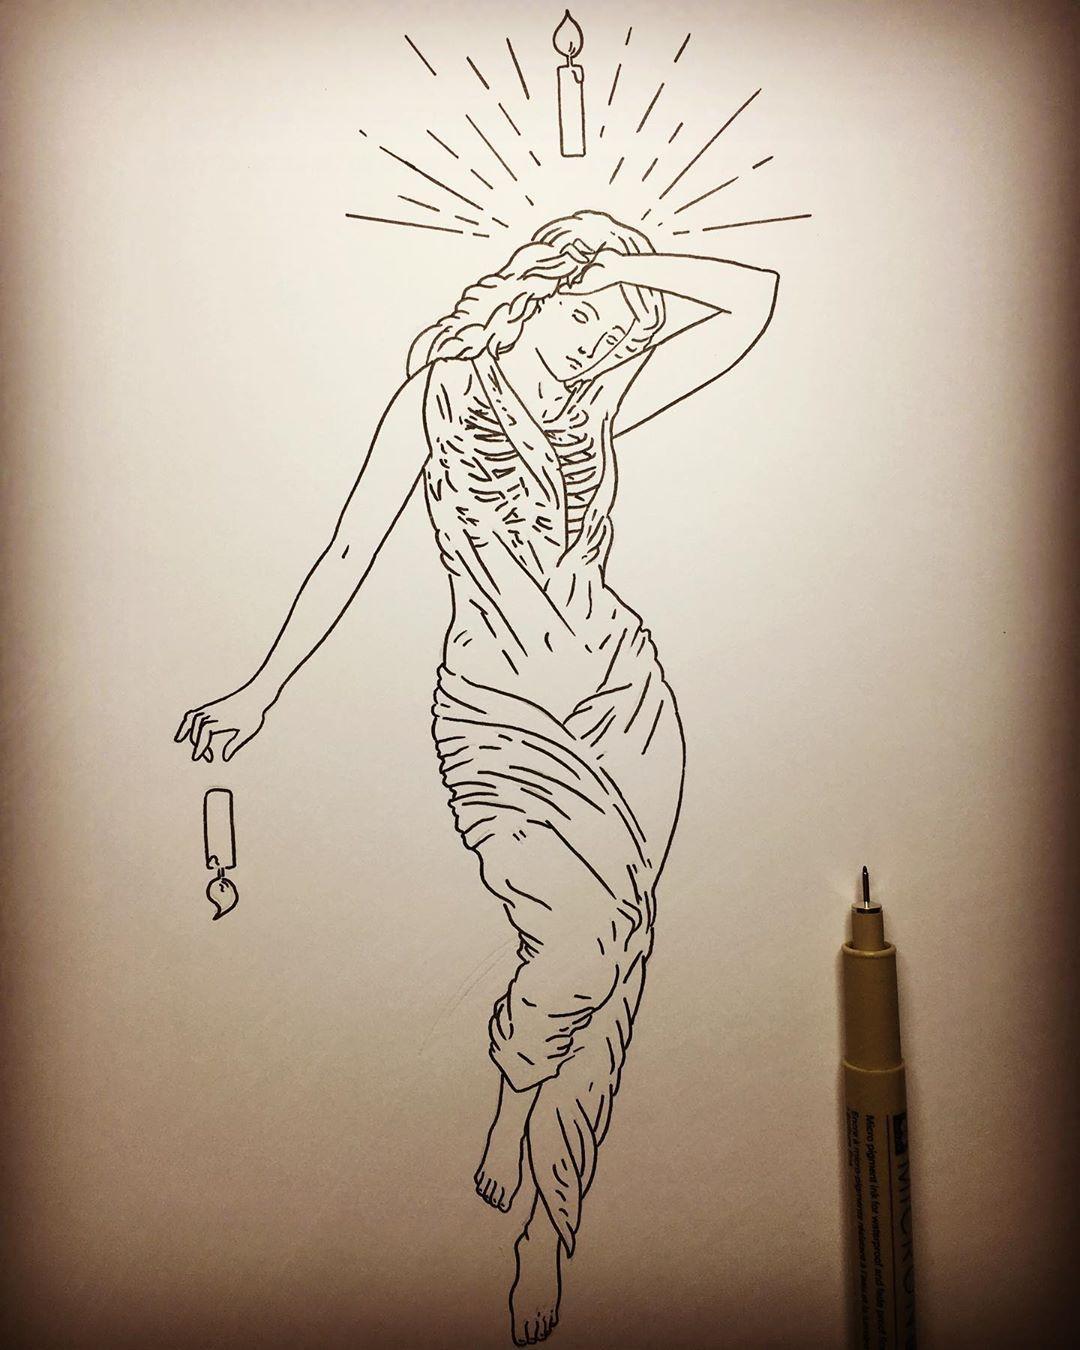 "Matthew Britton Illustration on Instagram: ""Work in progress. The World. #inkdrawing #pendrawing #inksketch #gothic #penandink #blackwork #blackandwhite #studiolife #wip…"""